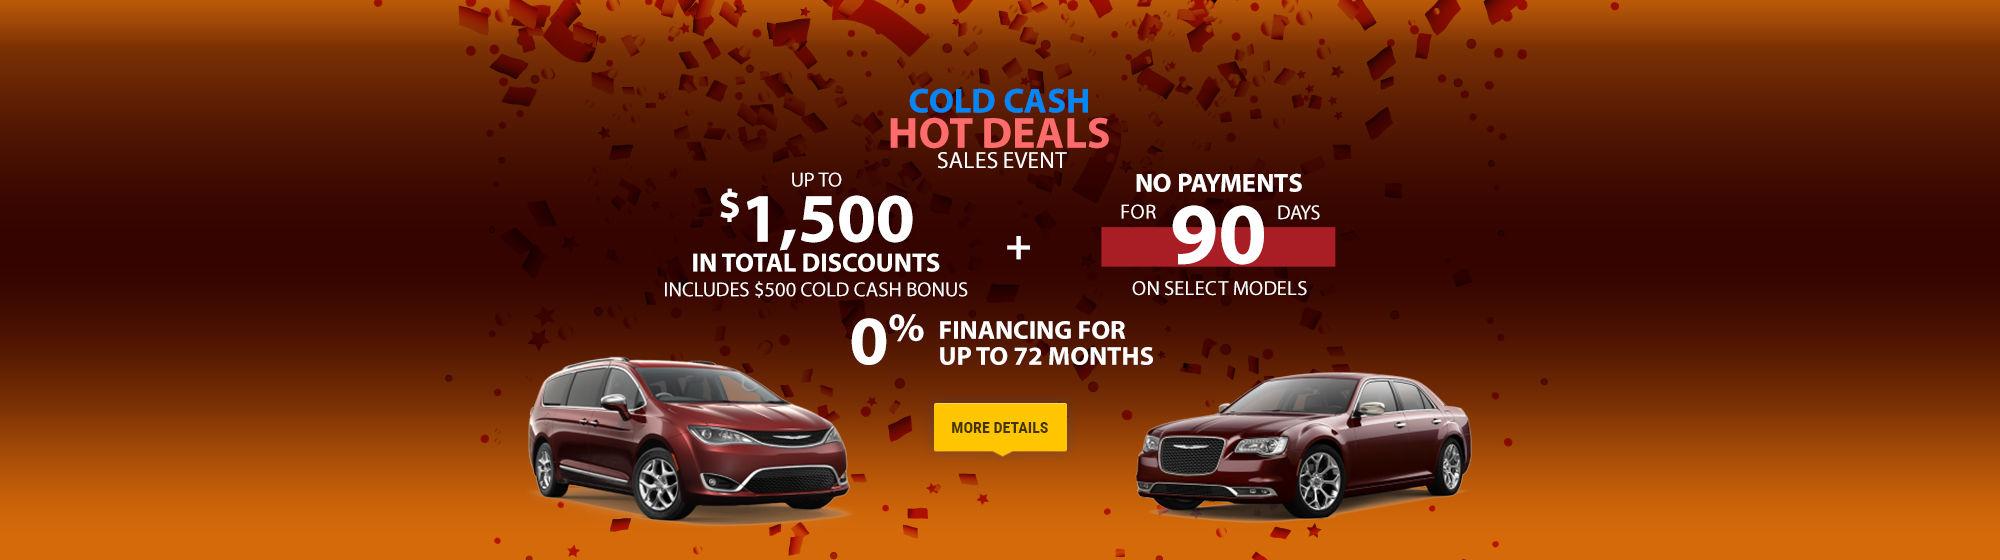 Cold Cash Hot Deals Sales Event - Chrysler